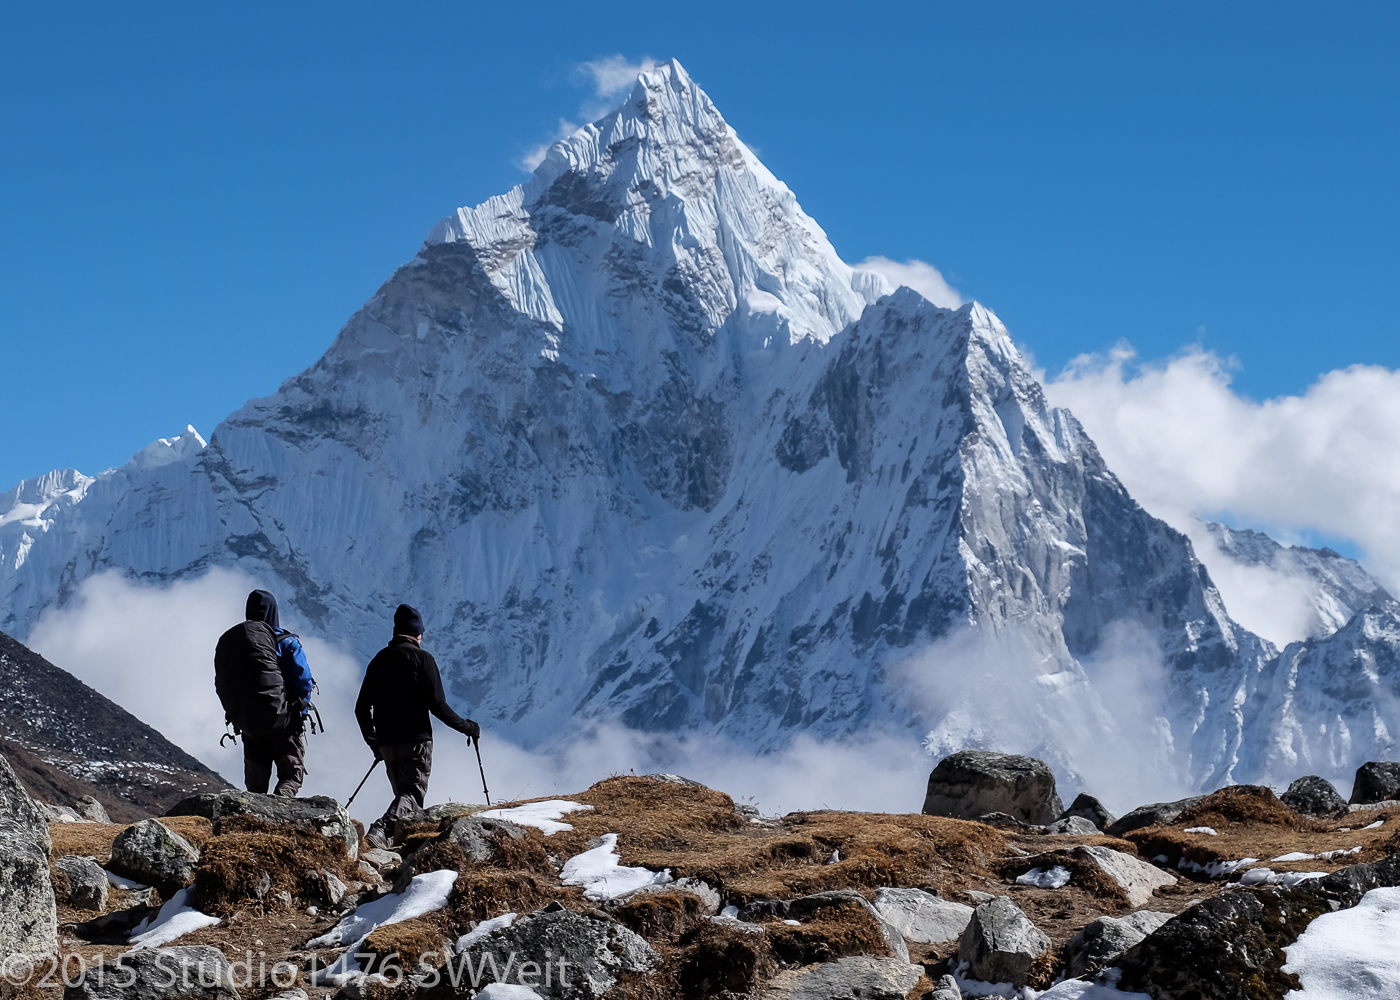 mt everest lodge trek nepal khumbu valley trail sierra club